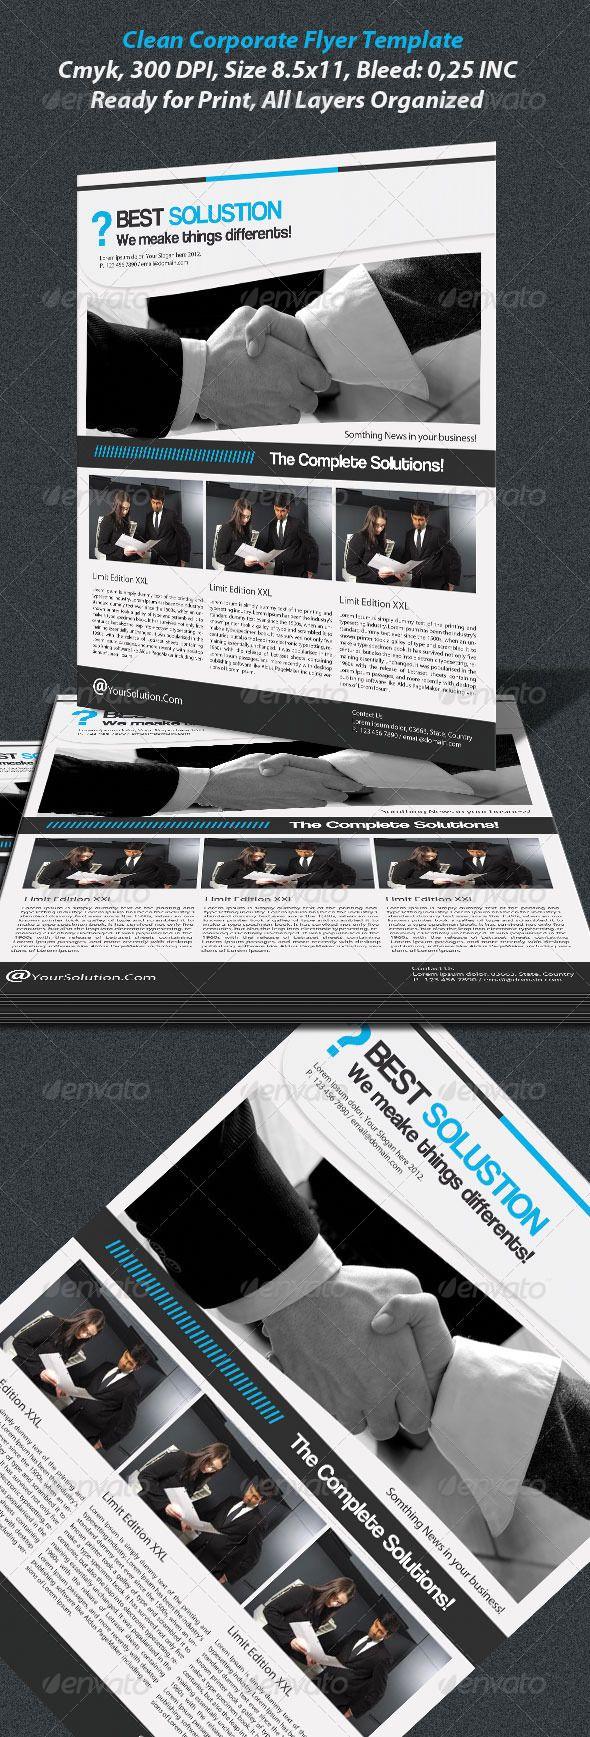 106 best Print Templates images on Pinterest | Print templates ...